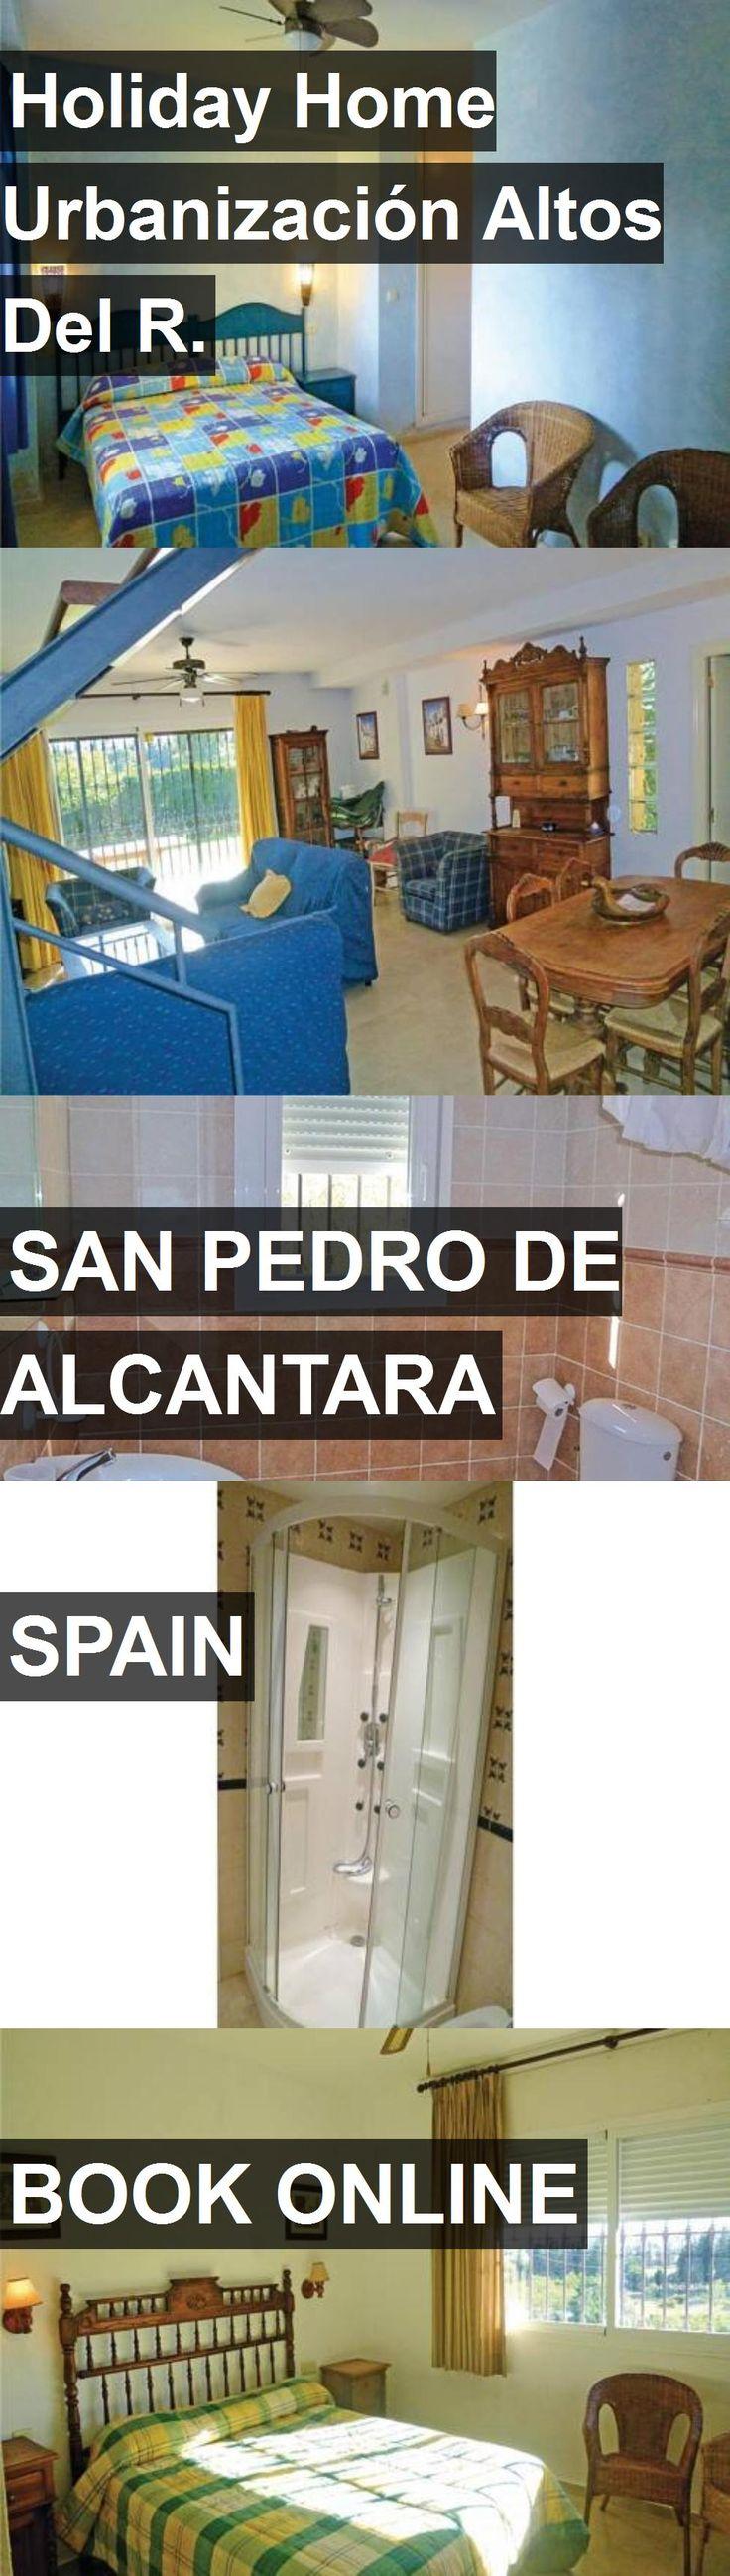 Hotel Holiday Home Urbanización Altos Del R. in San Pedro de Alcantara, Spain. For more information, photos, reviews and best prices please follow the link. #Spain #SanPedrodeAlcantara #HolidayHomeUrbanizaciónAltosDelR. #hotel #travel #vacation